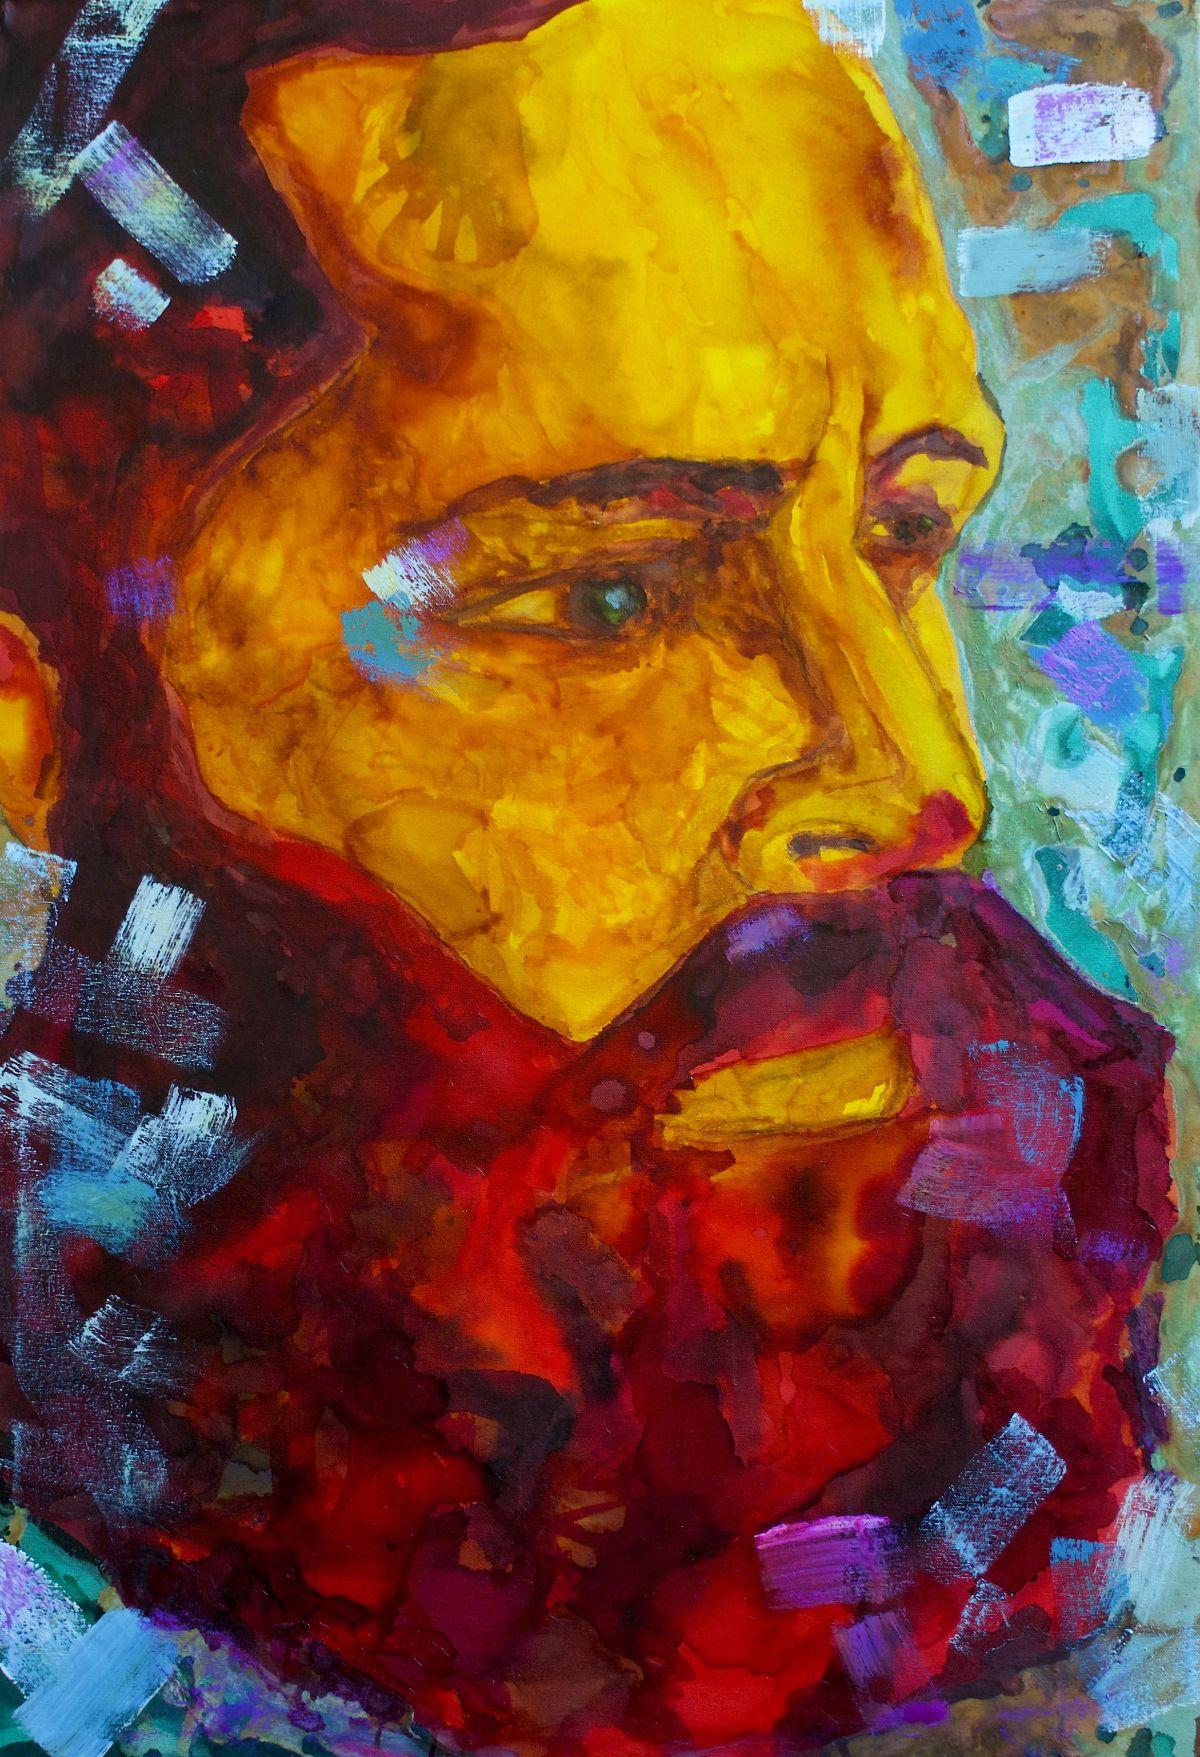 Kunst: Corraggio da Leoni van kunstenaar  Beddru